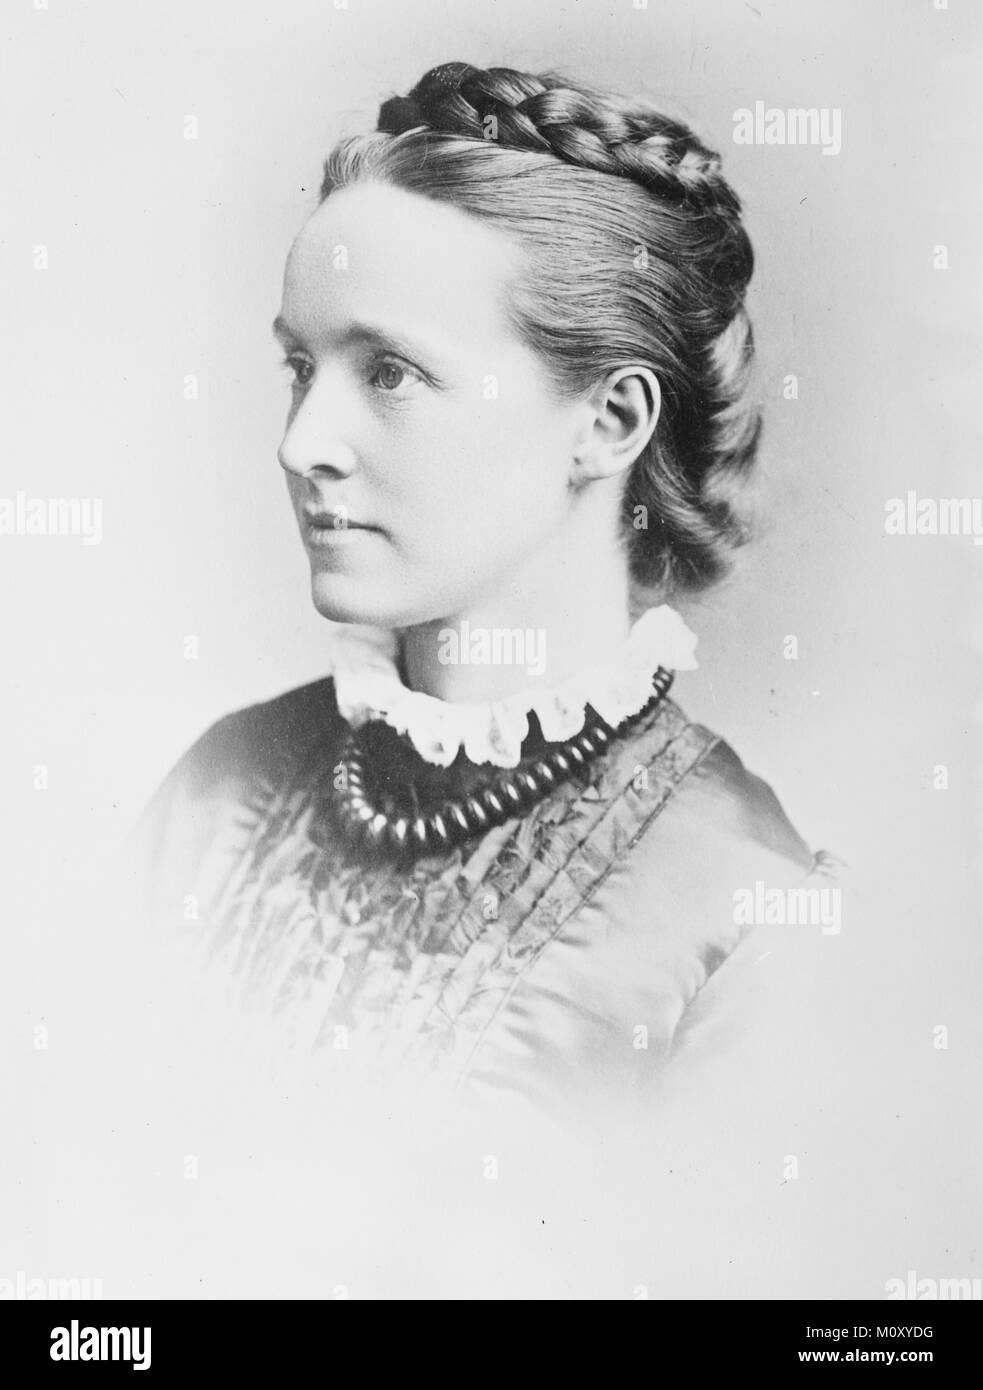 Millicent Fawcett - Stock Image